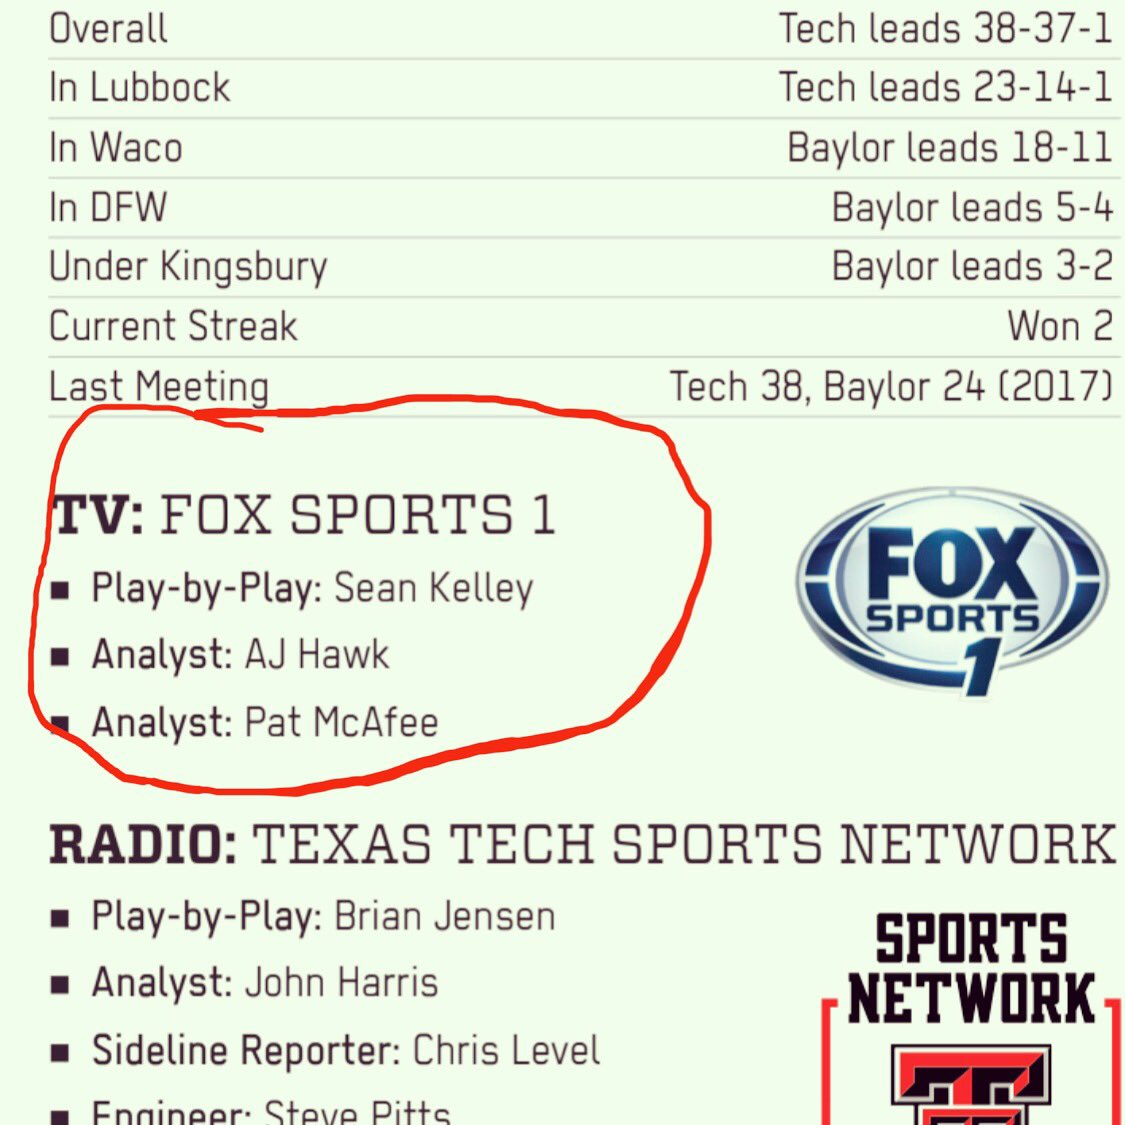 It's happening! 12:00 eastern Saturday on @FS1 @PatMcAfeeShow @SeanKelleyLive @BUFootball vs. @TexasTechFB